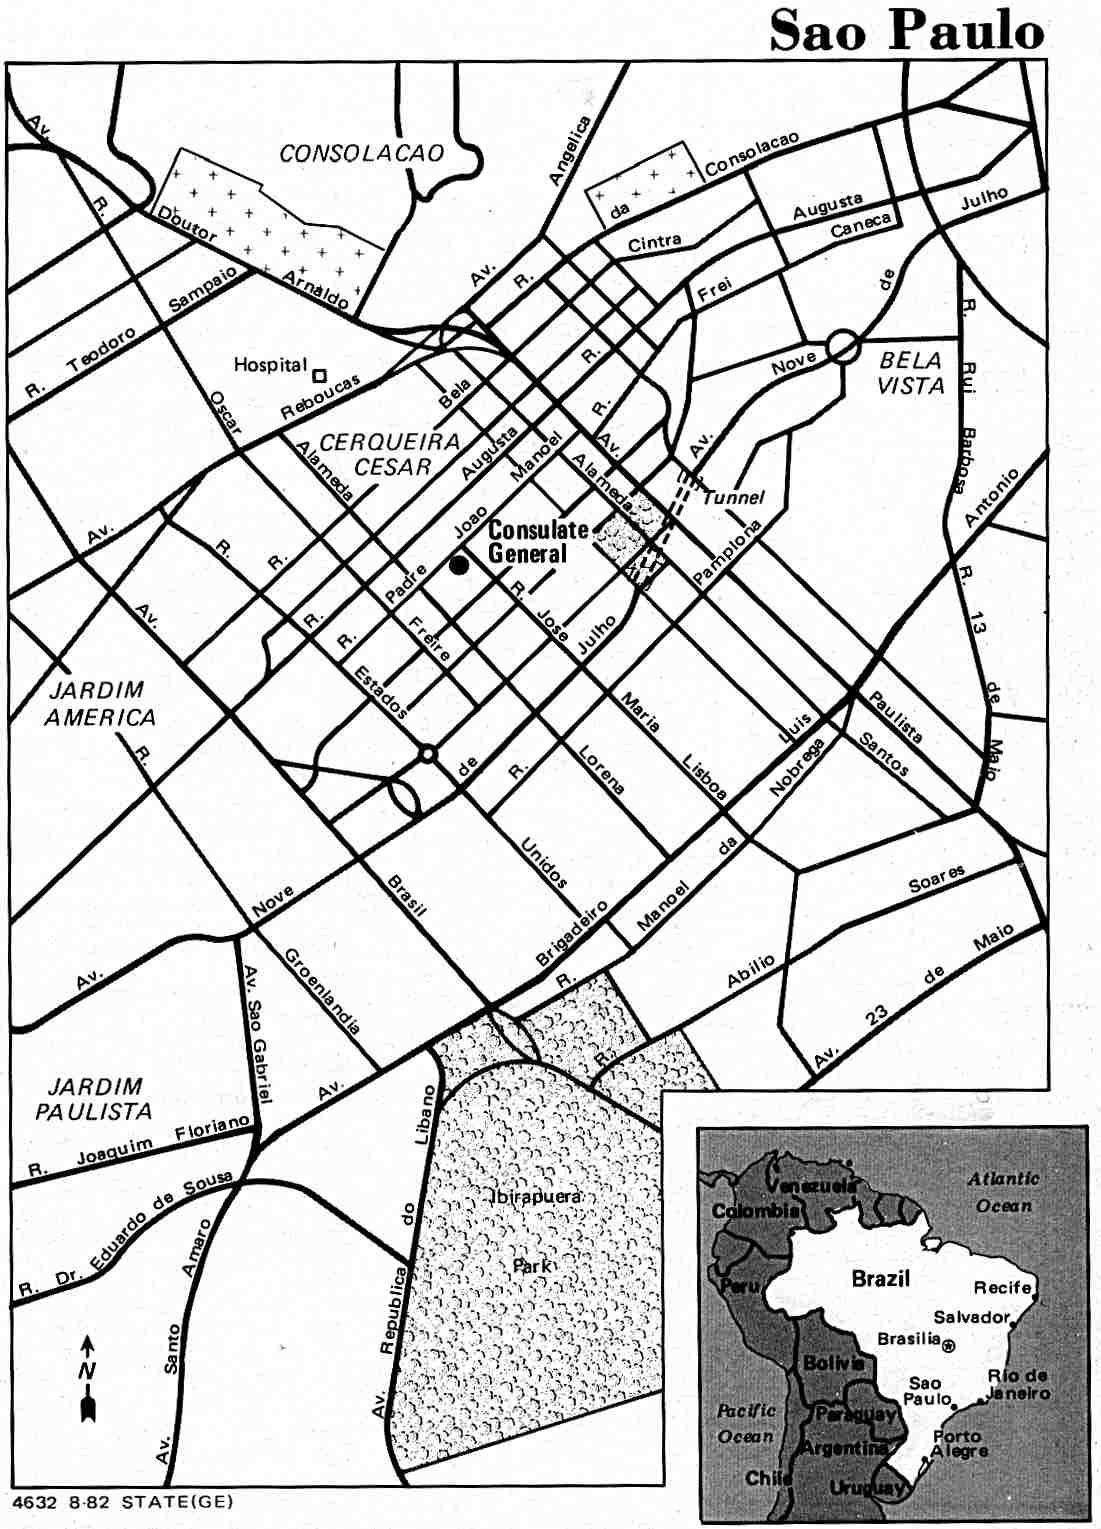 Stadsplattegrond São Paulo